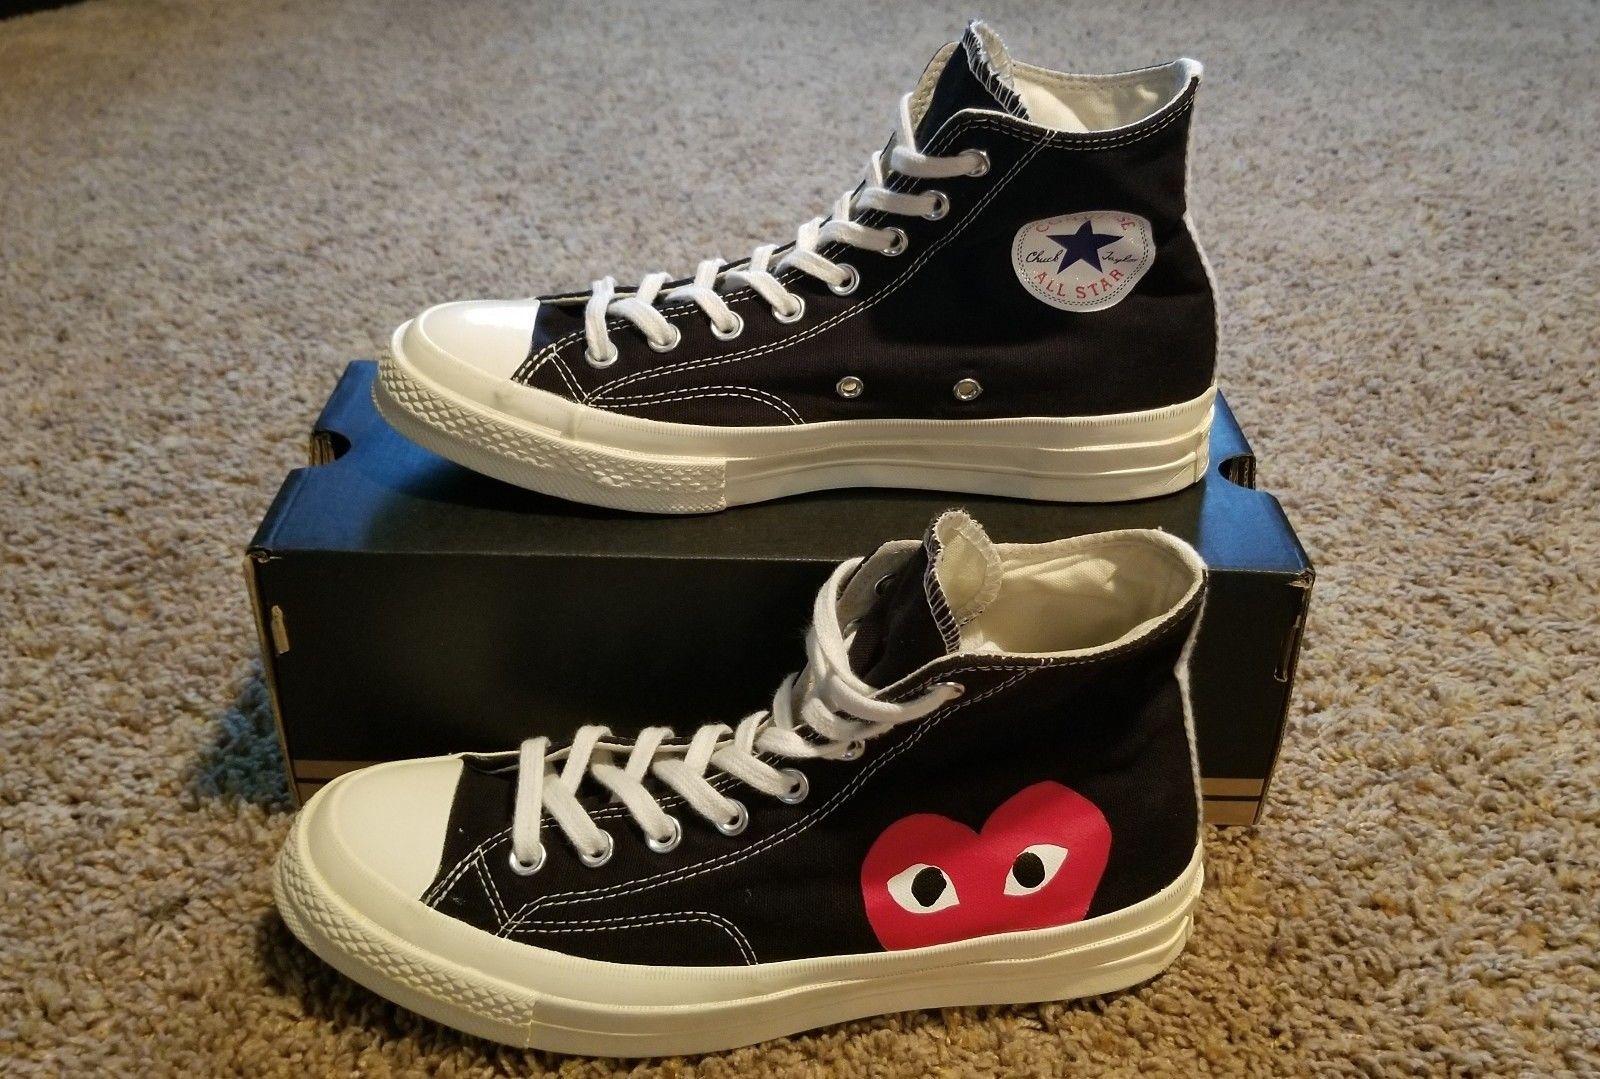 Converse X Comme Des Garcons Play Chuck Taylor U S Shoe Size Men S 8 Mens Boots Fashion Comfortable Mens Shoes High Top Sneakers Fashion